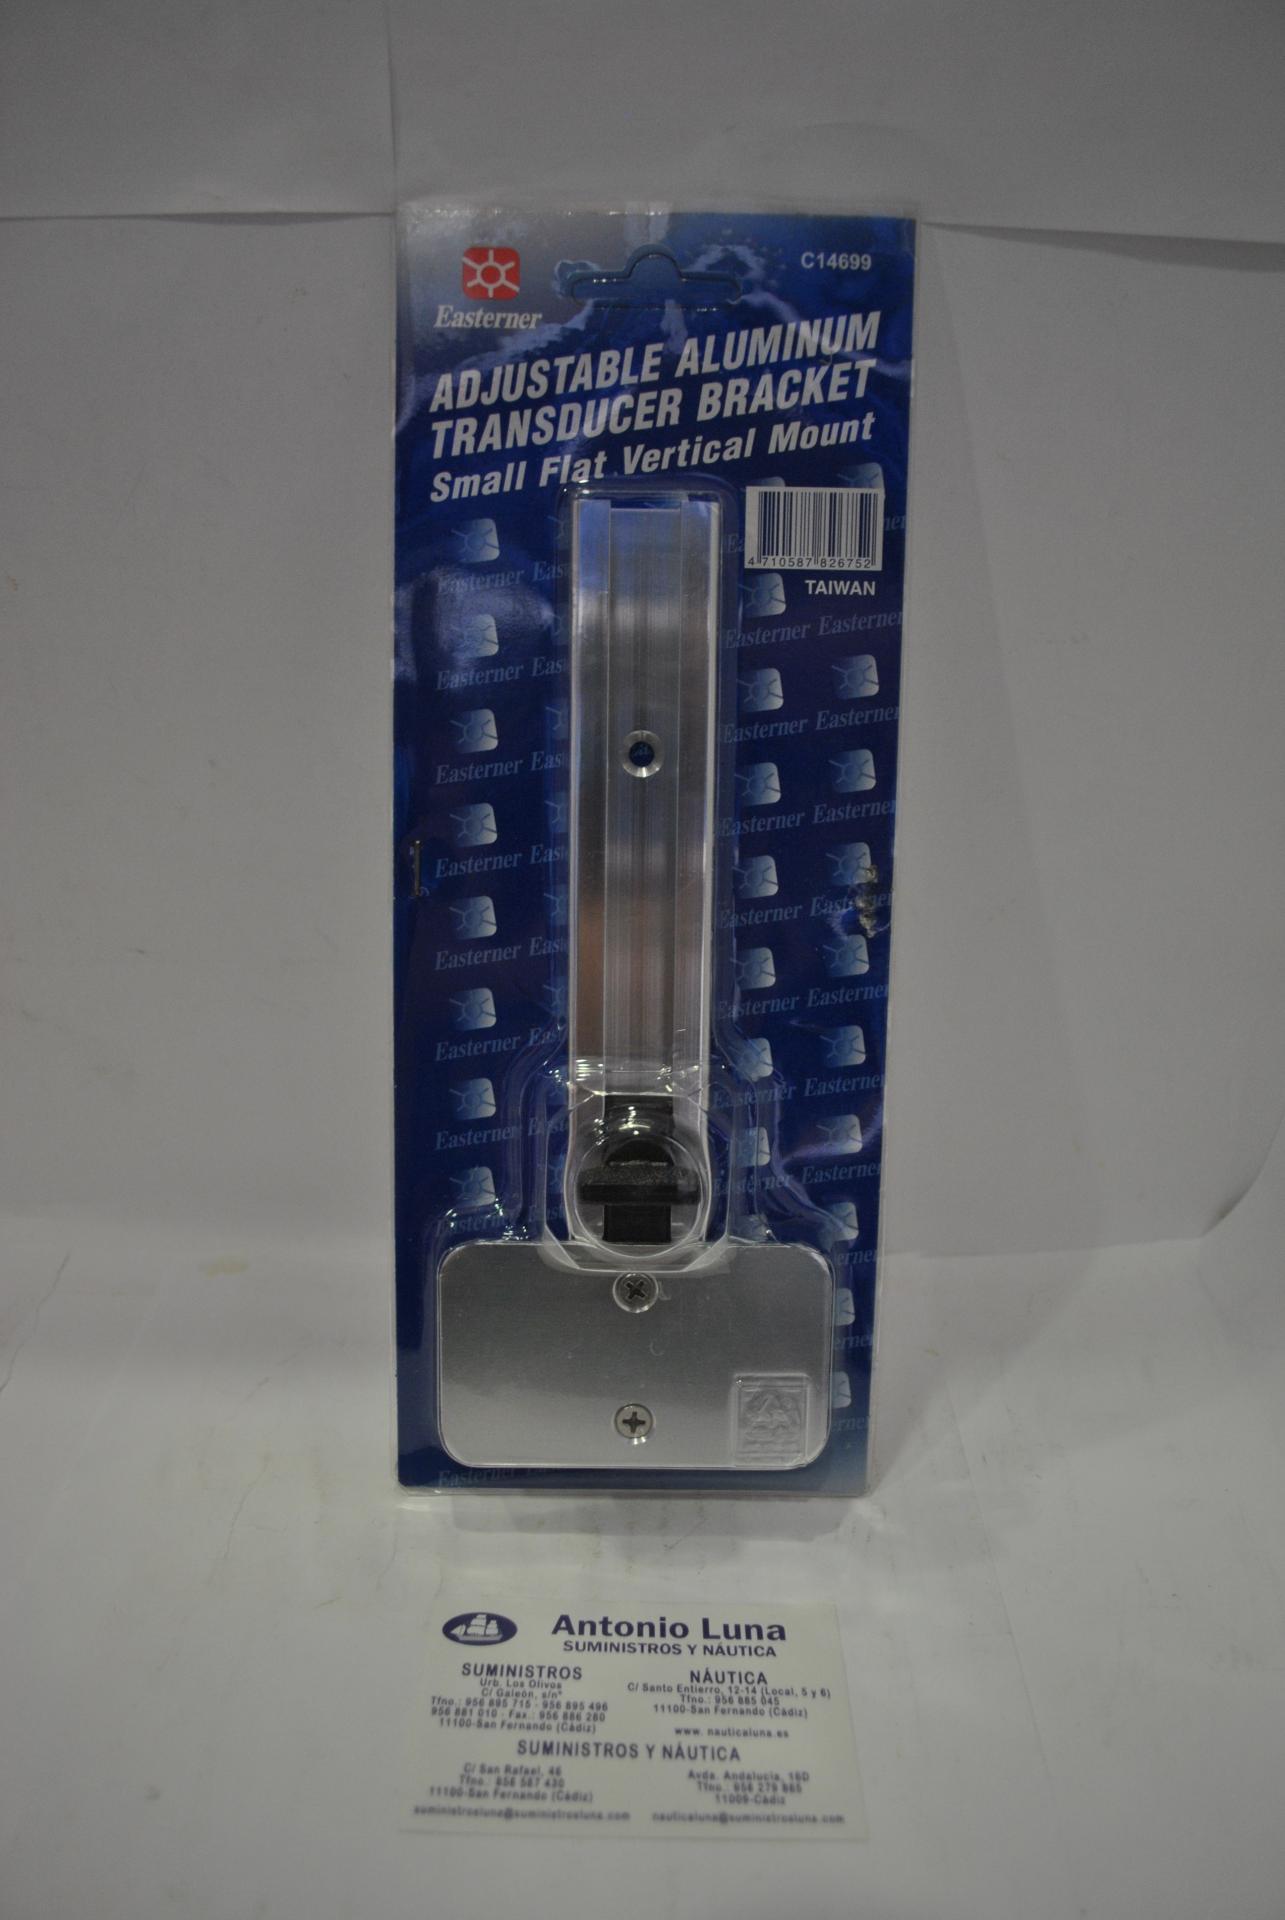 Soporte para transductor de aluminio C14699 Easterner